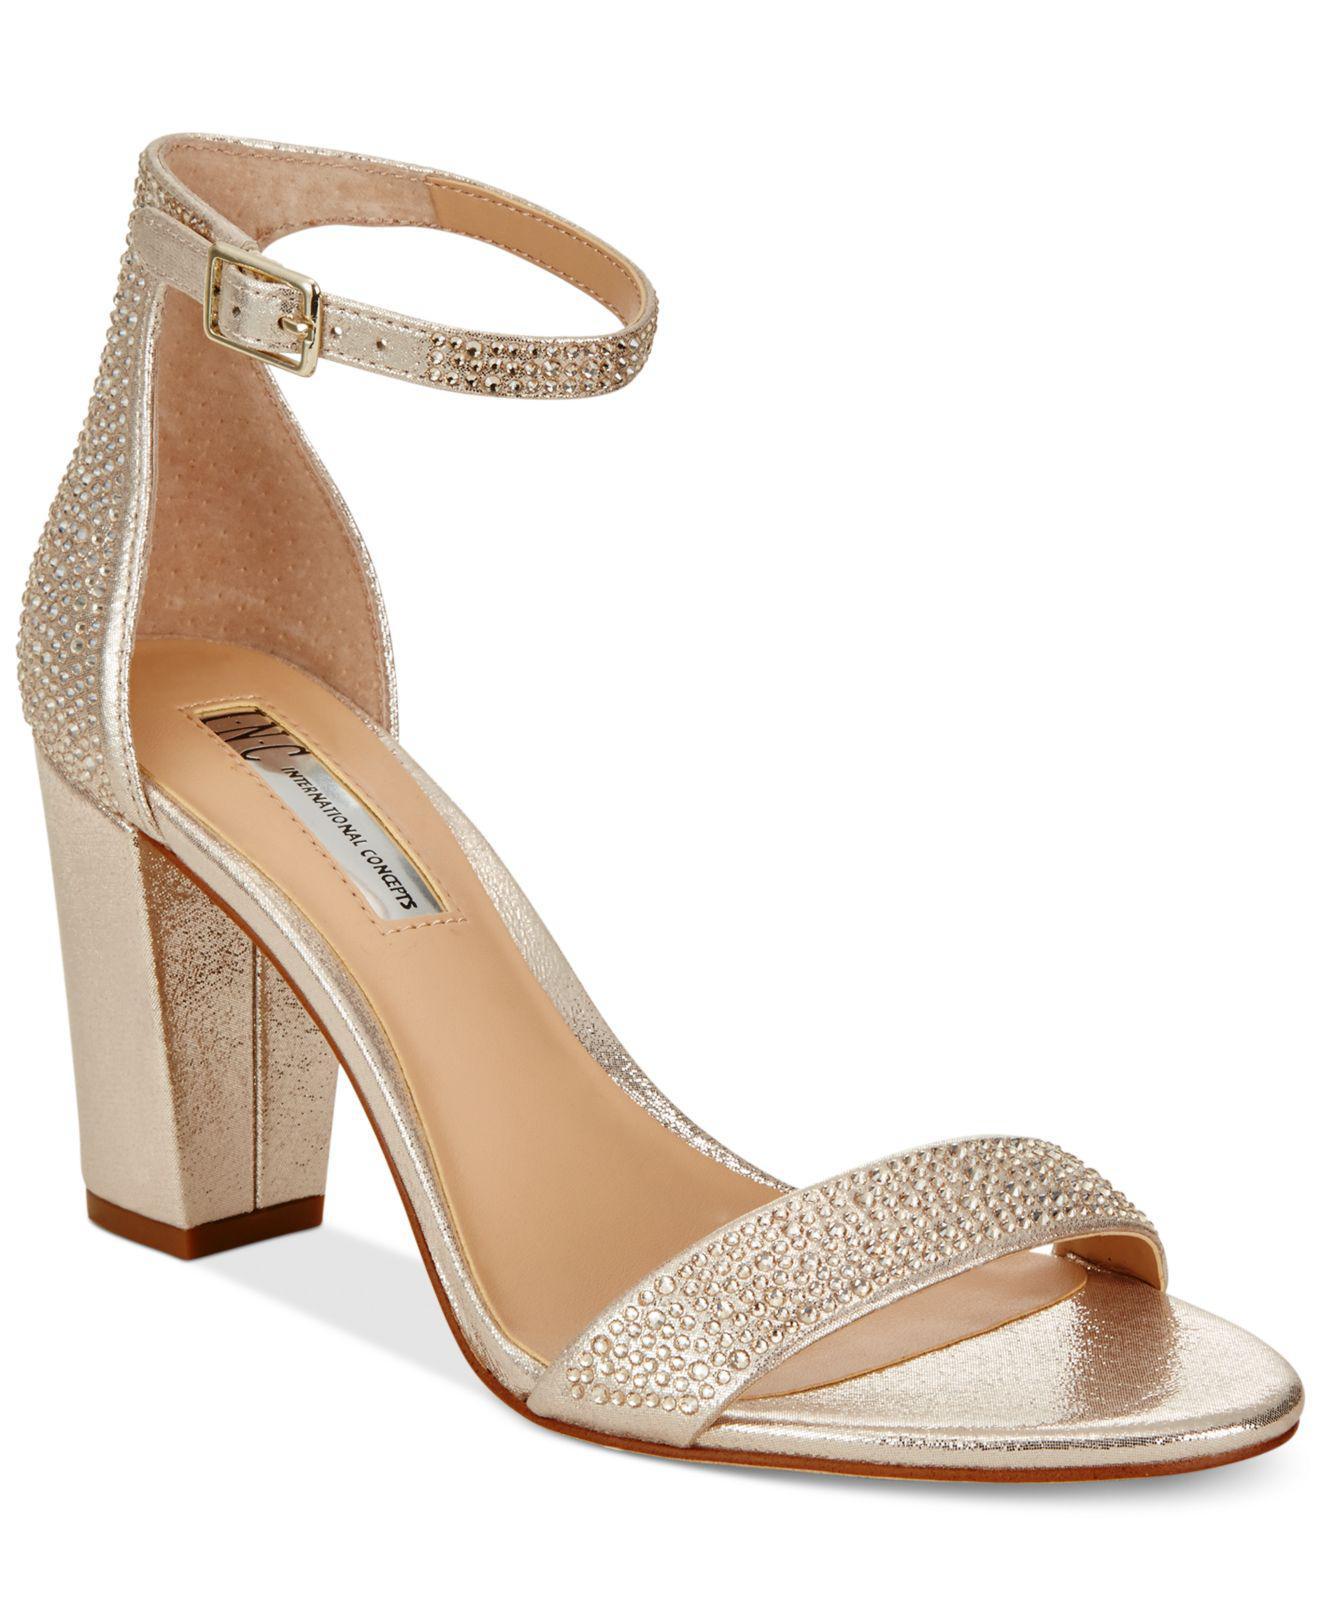 0c27adc9662a1c INC International Concepts. Women s Metallic Kivah Block-heel Dress Sandals